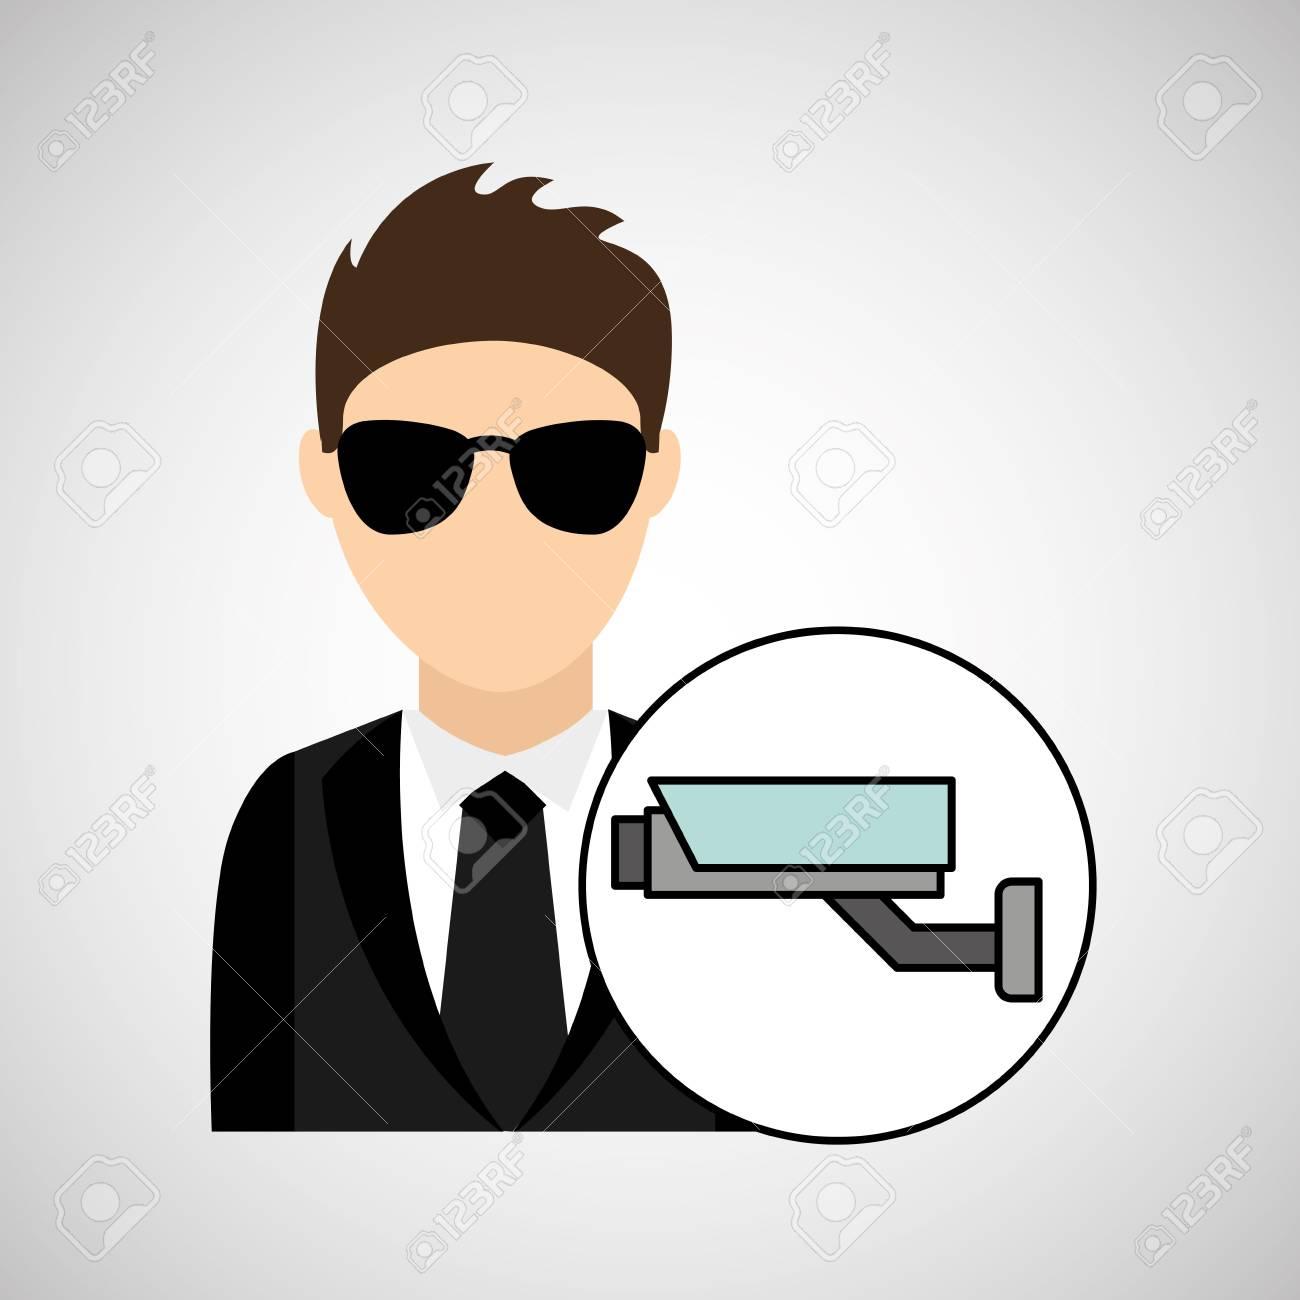 Man Cartoon Digital Technology Security Surveillance Camera Vector